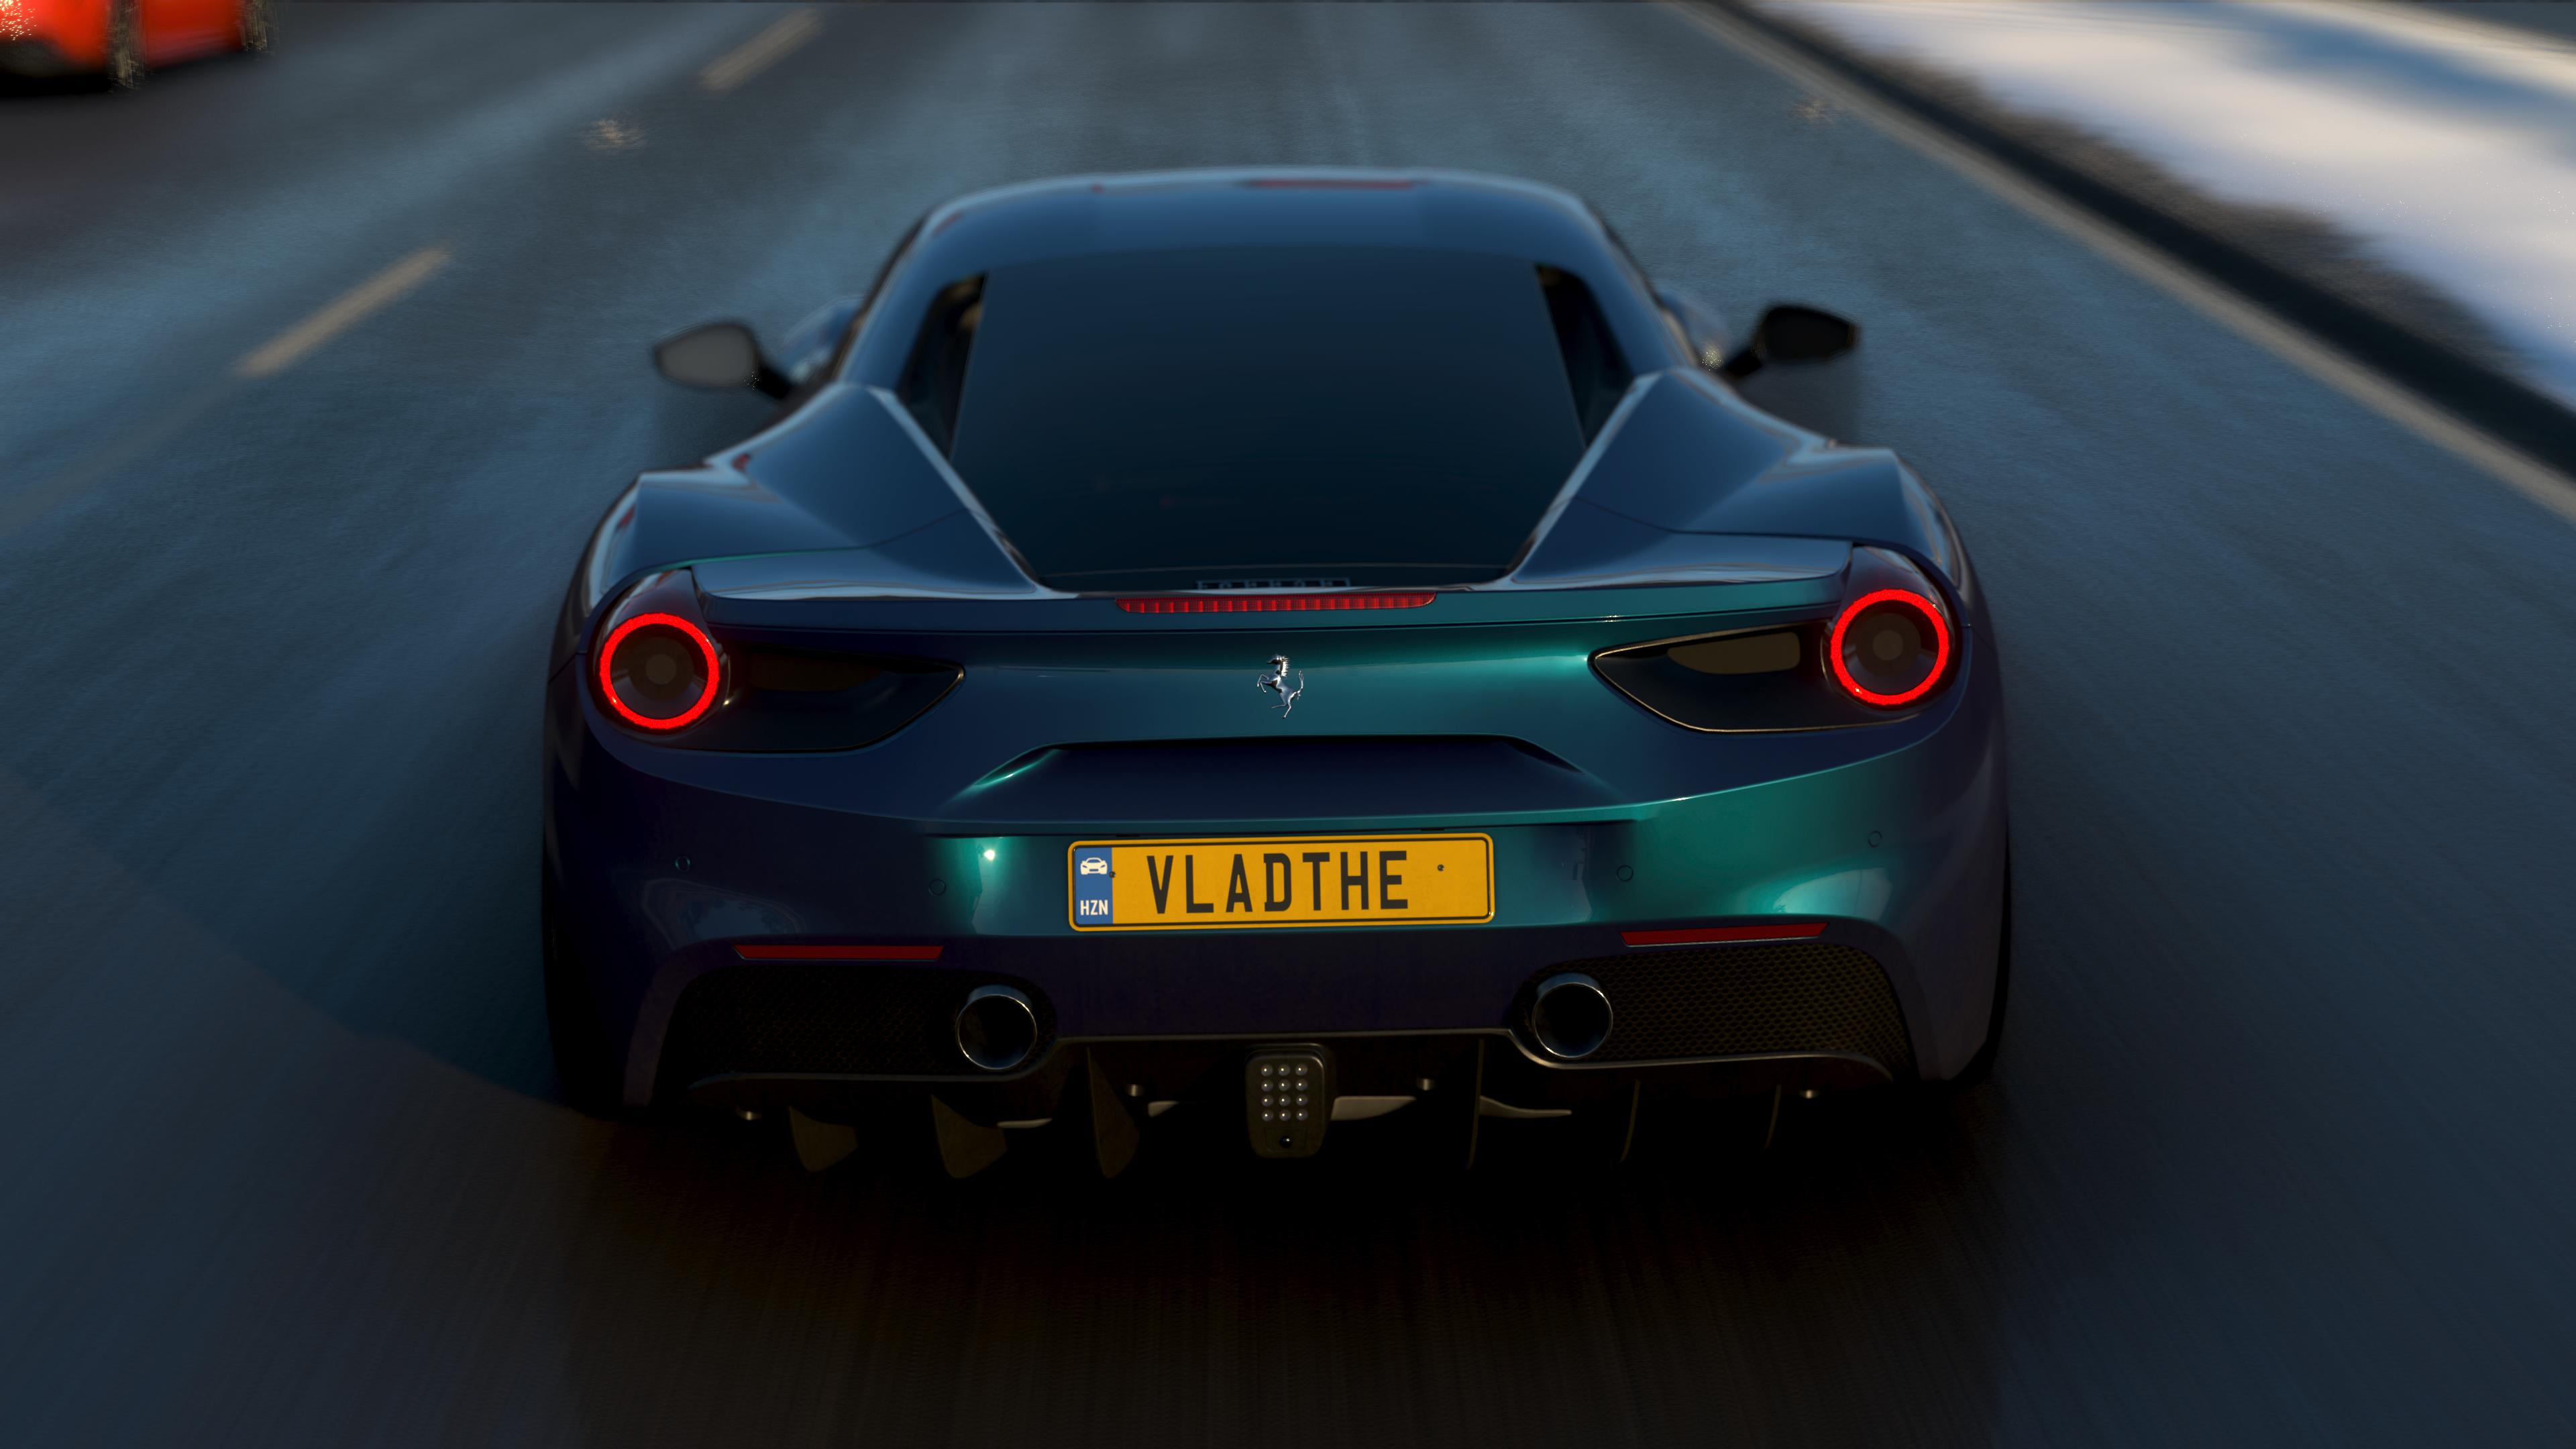 Forza Forza Horizon 4 Video Games Ferrari Car Vehicle Ferrari 488 Wallpaper Resolution 3840x2160 Id 160488 Wallha Com